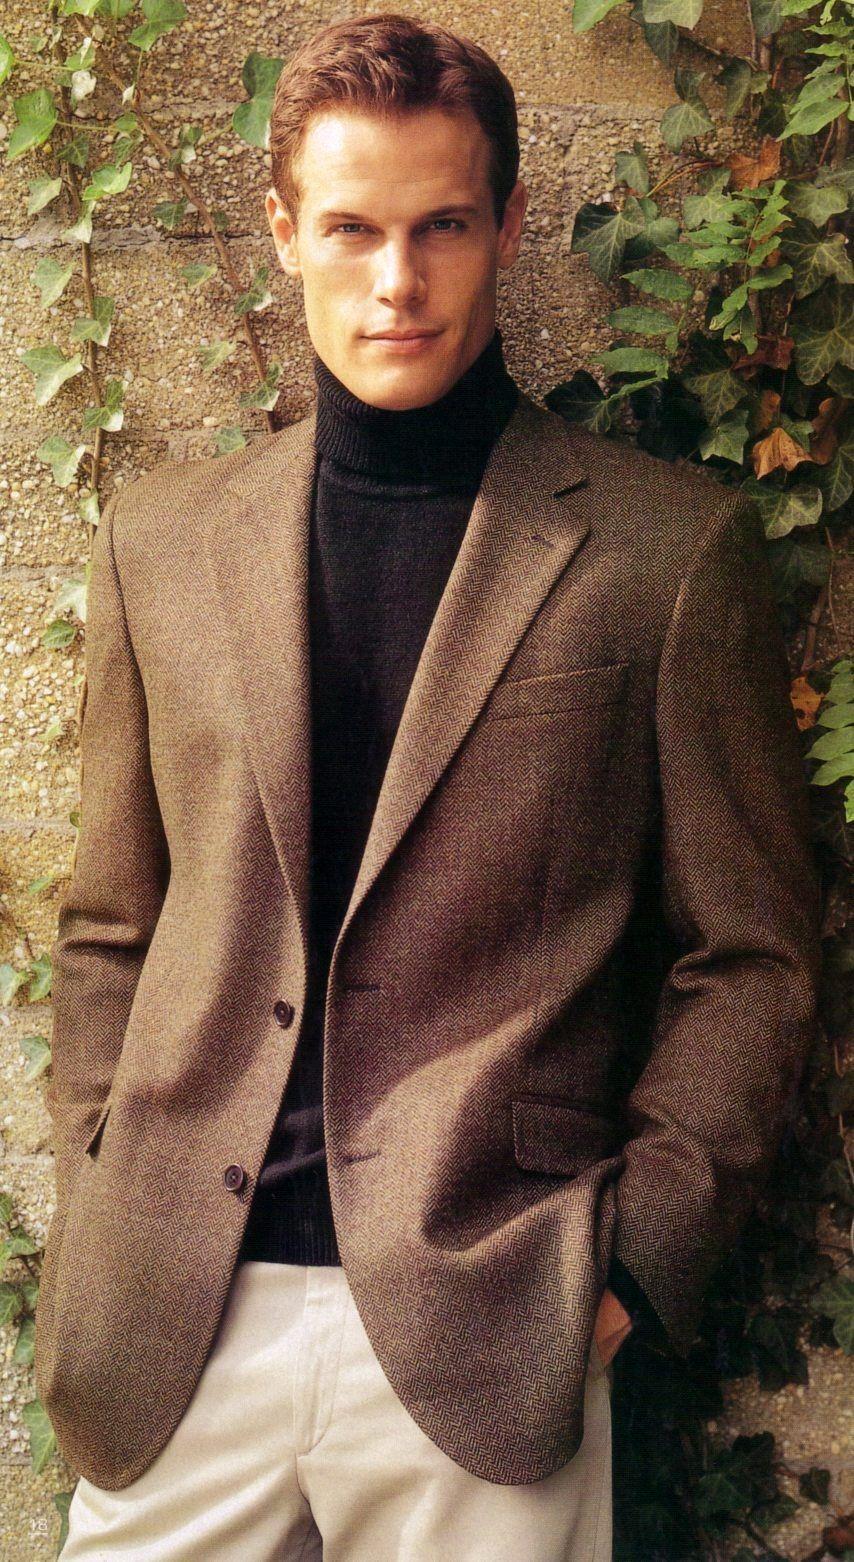 Brett Hollands by @Matt Albiani for @Brooks Brothers (Fall 2002) #BrettHollands #MattAlbiani #BrooksBrothers #BrooksBros #model #supermodel #Canadian #jacket